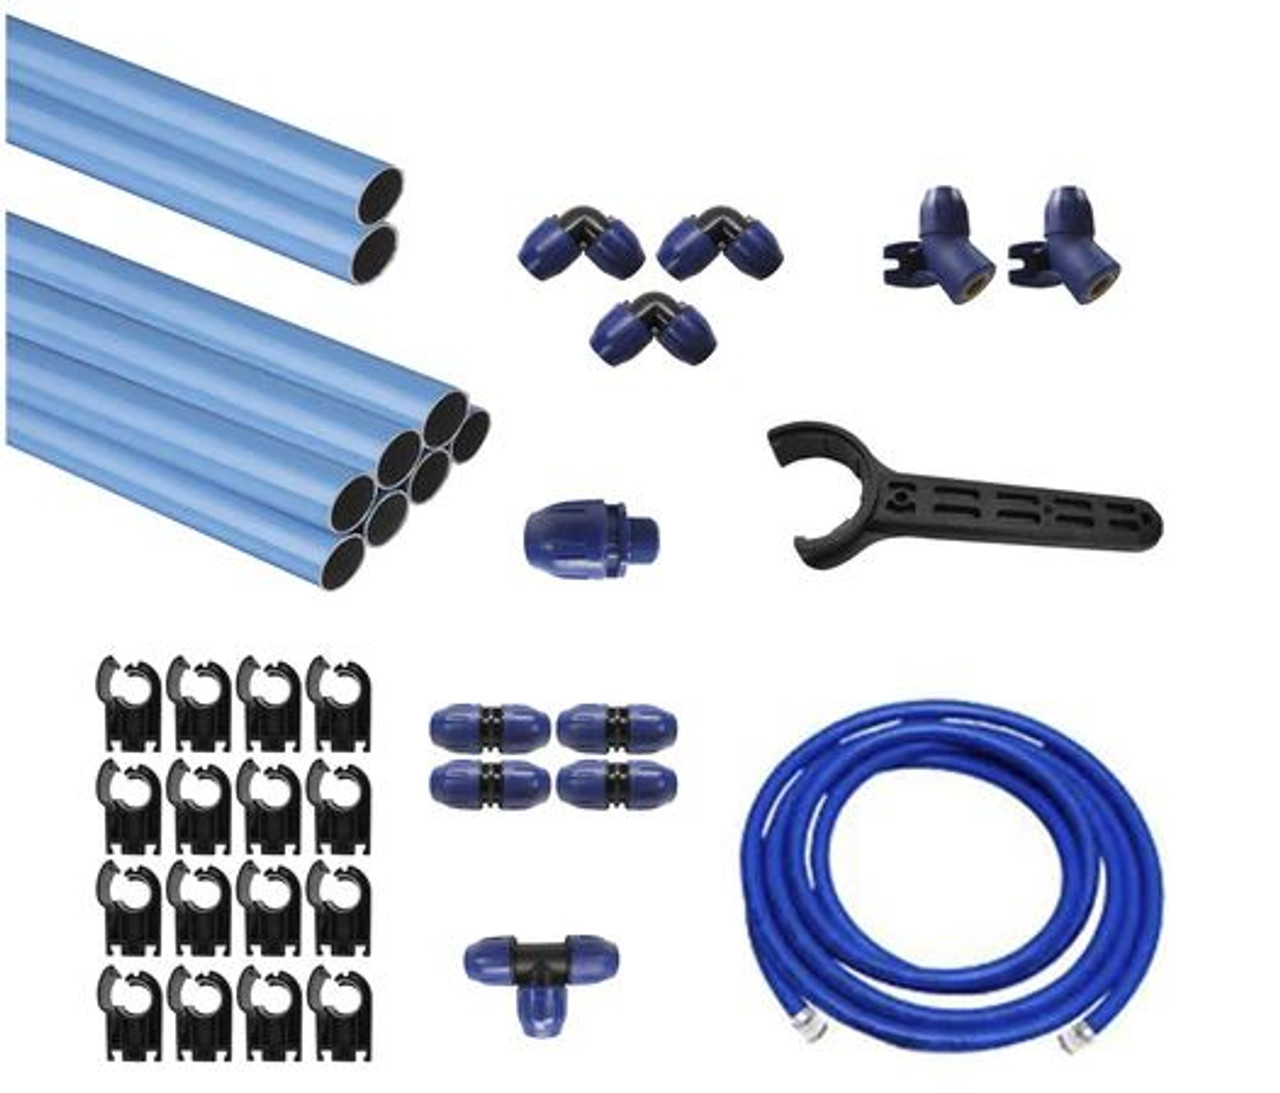 "QLKIT2 98 Foot 3/4"" Aluminum Piping System"